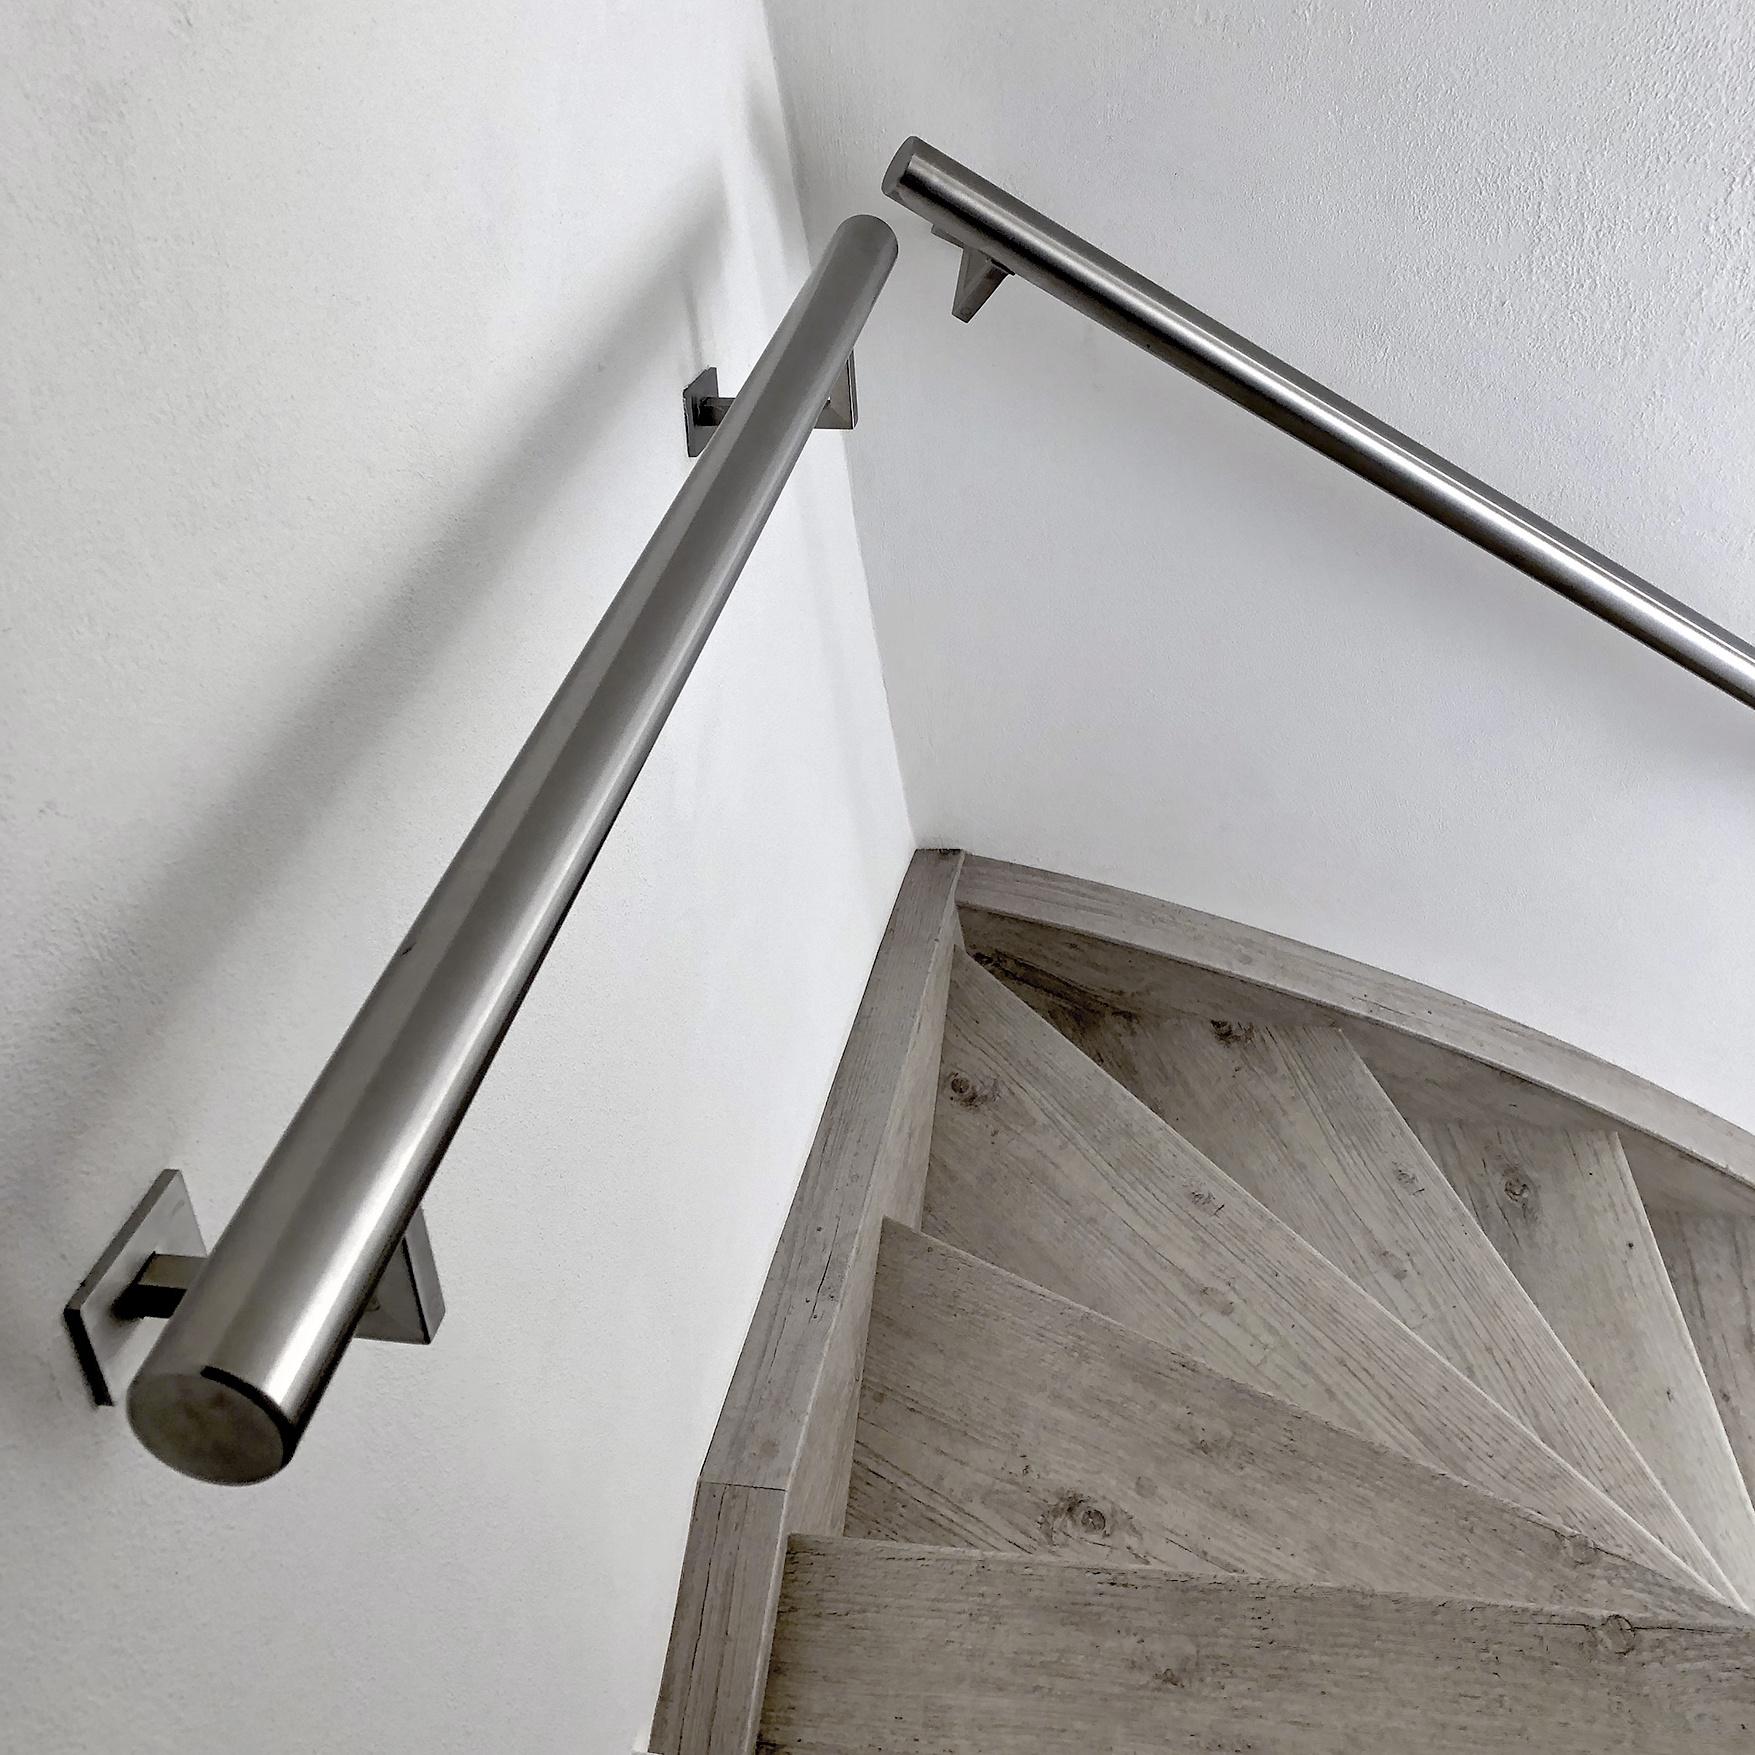 Handlauf Edelstahl rund gebürstet Modell 11 - Runde Edelstahl Treppengeländer - Treppenhandlauf